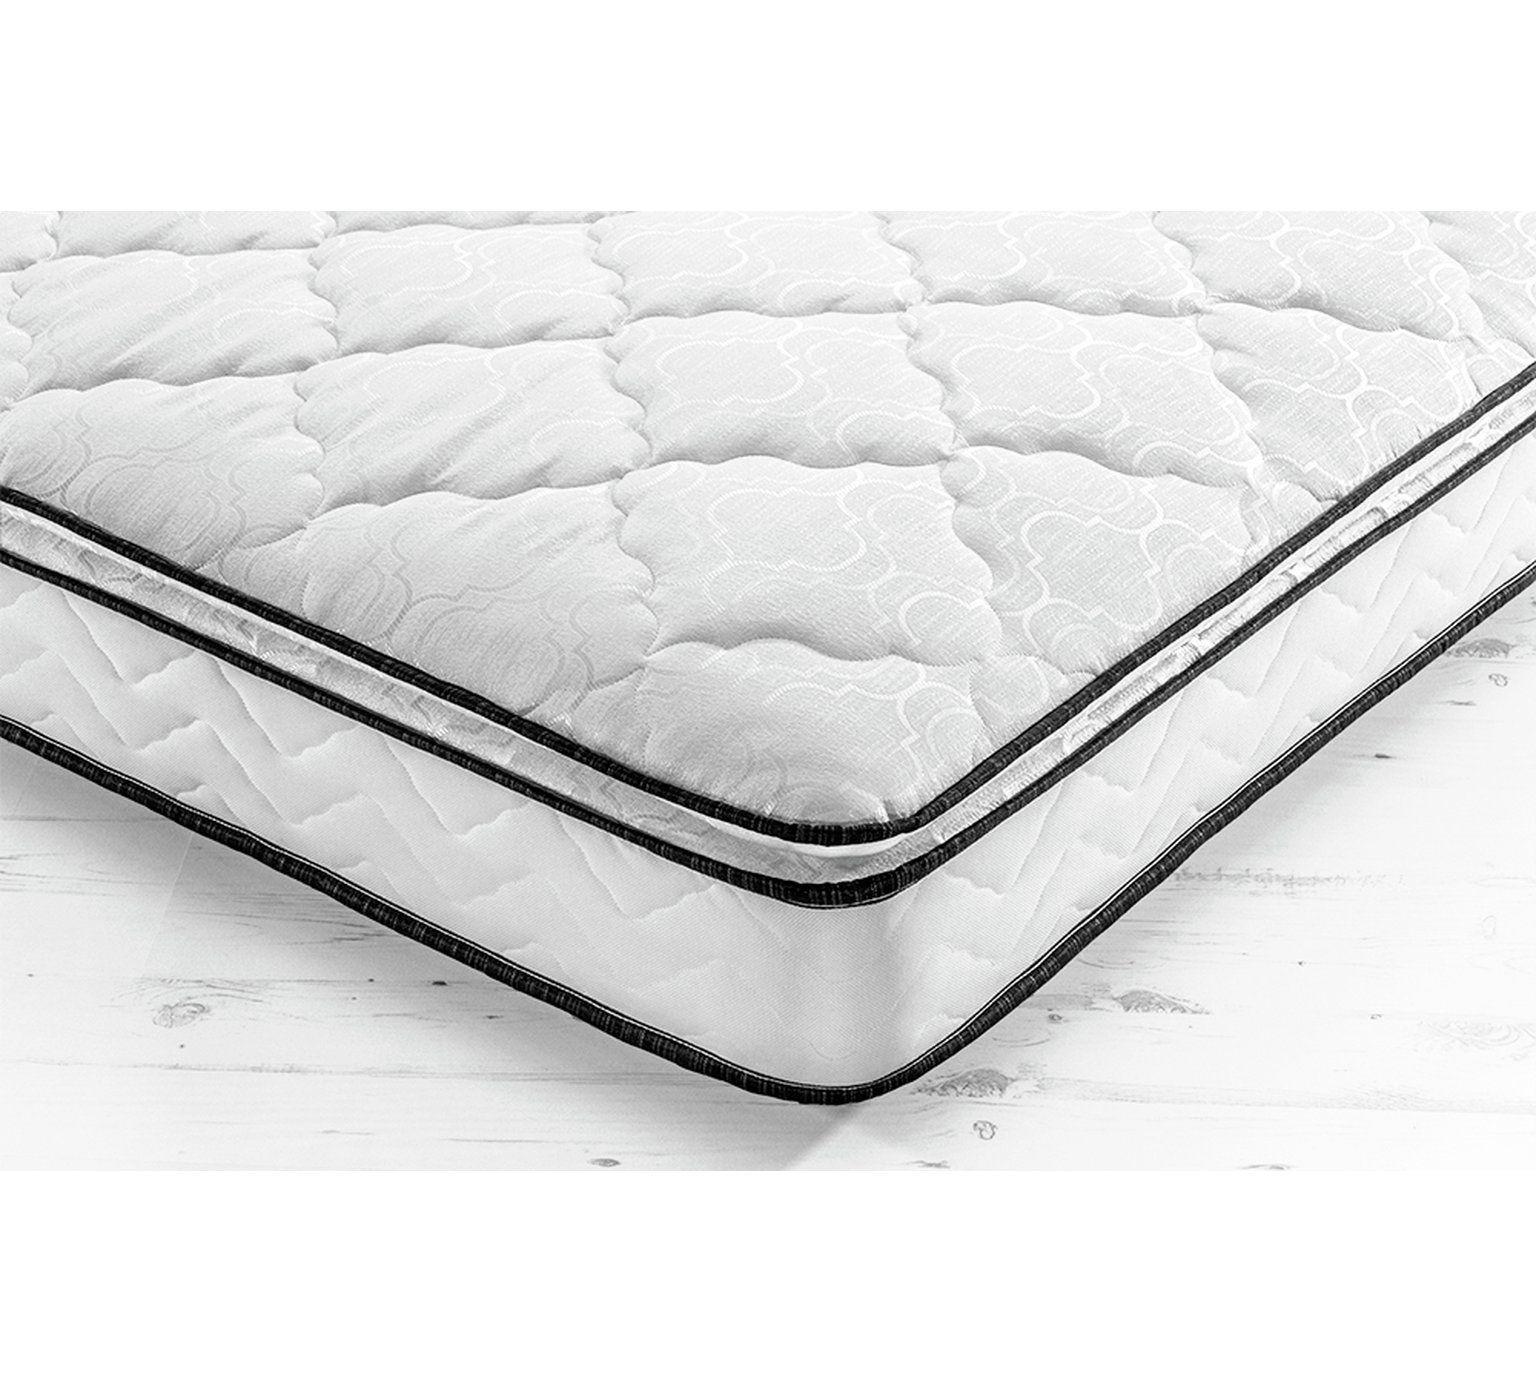 Buy Airsprung Keswick 800 Luxury Pillowtop Small Double Mattress At Argos Co Uk Visit Argos Co Uk To Double Mattress Small Double Mattress Mattress